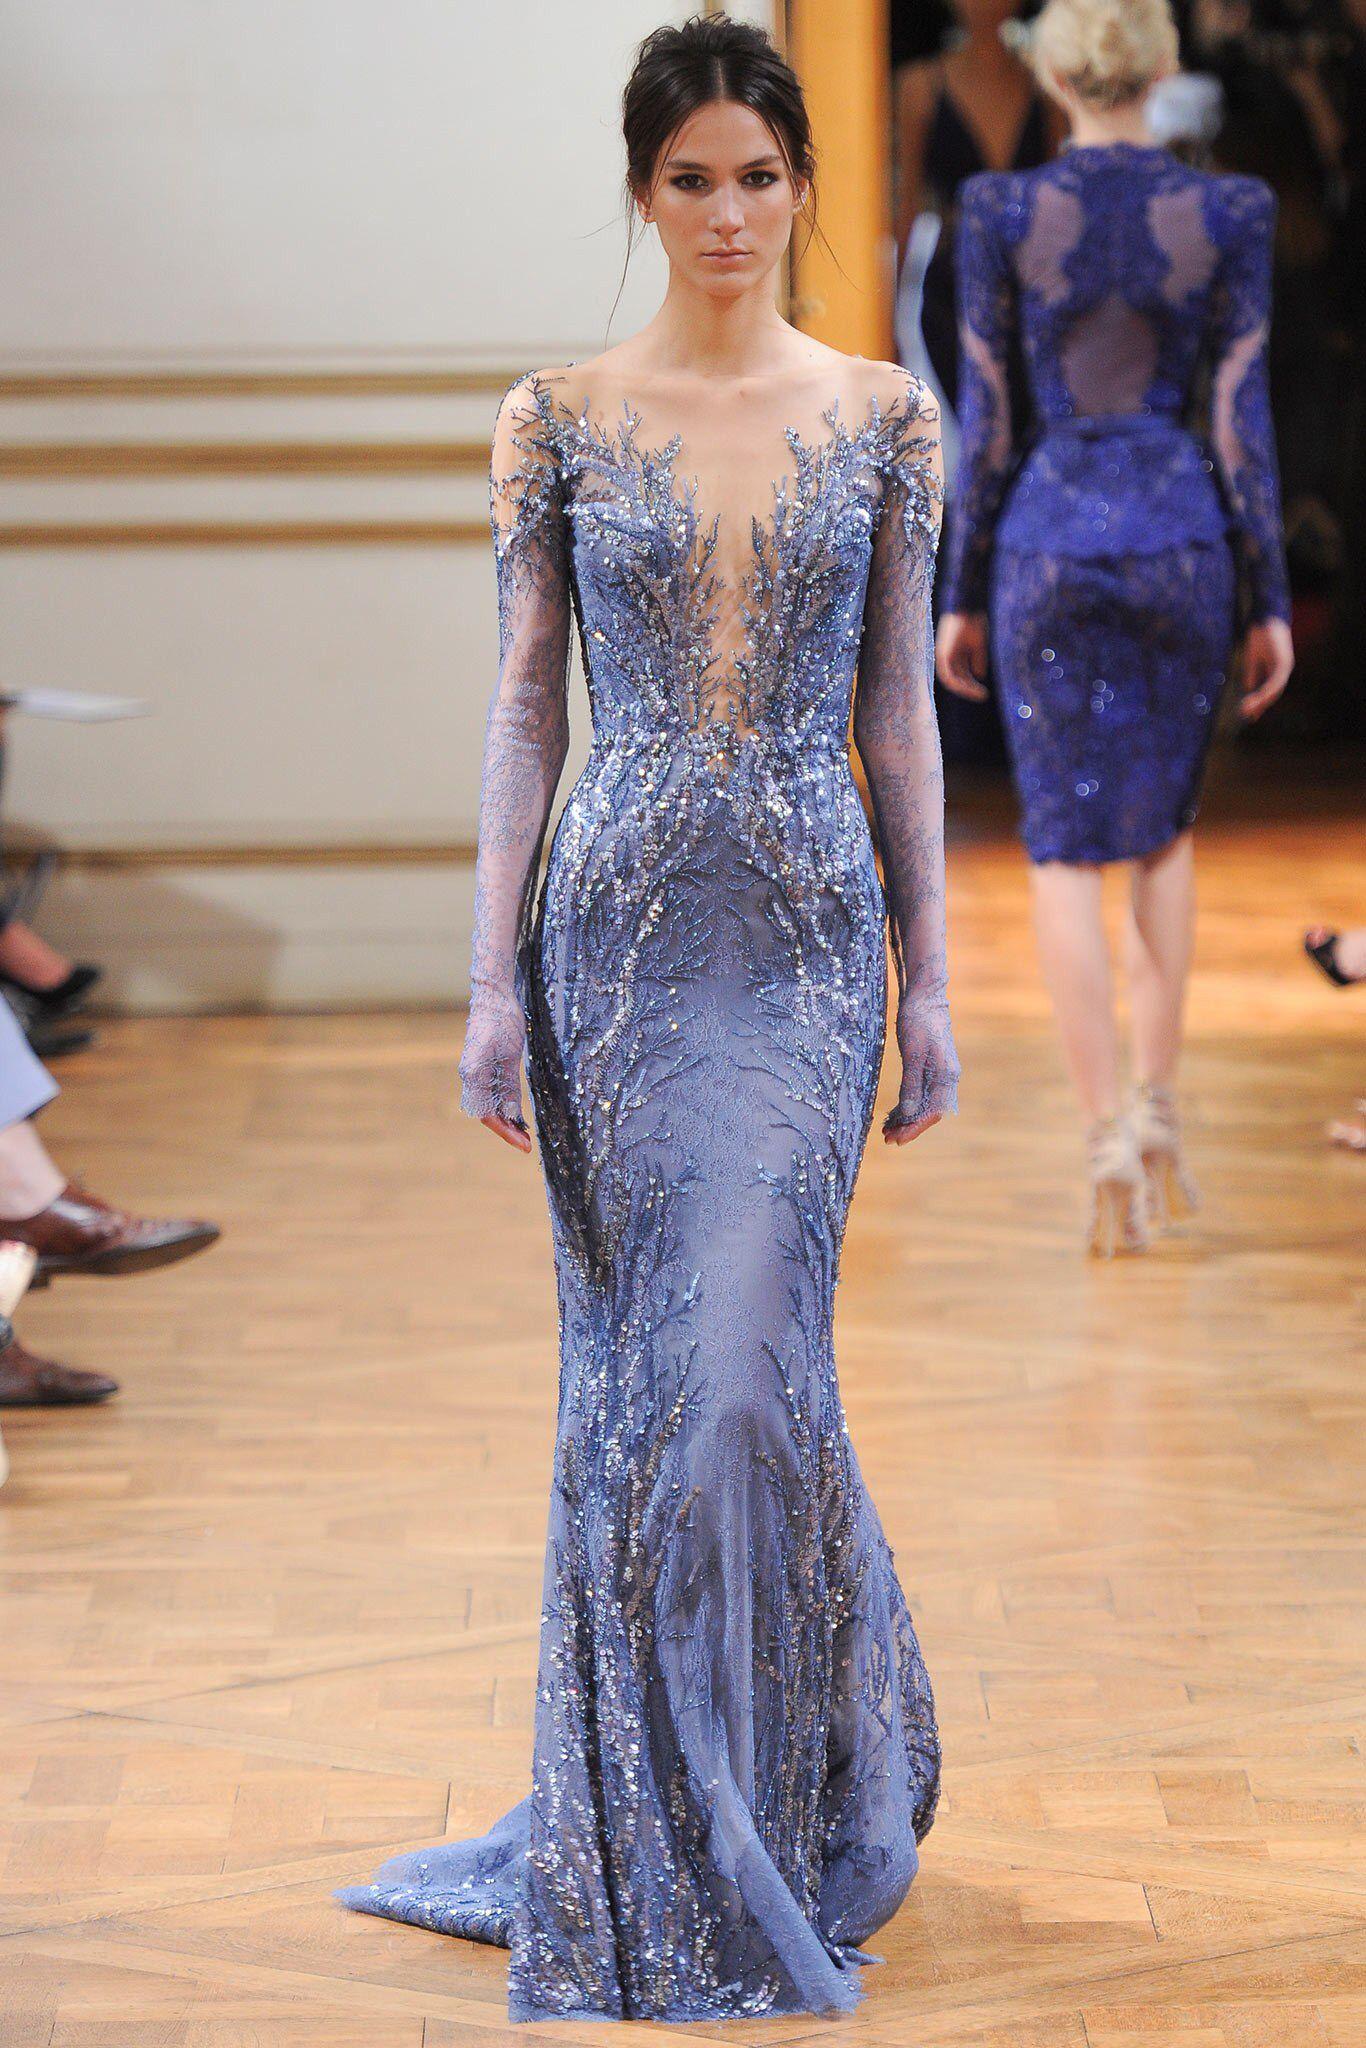 Zuhair Murad Fall 2013 Couture Fashion Show | Gowns ...